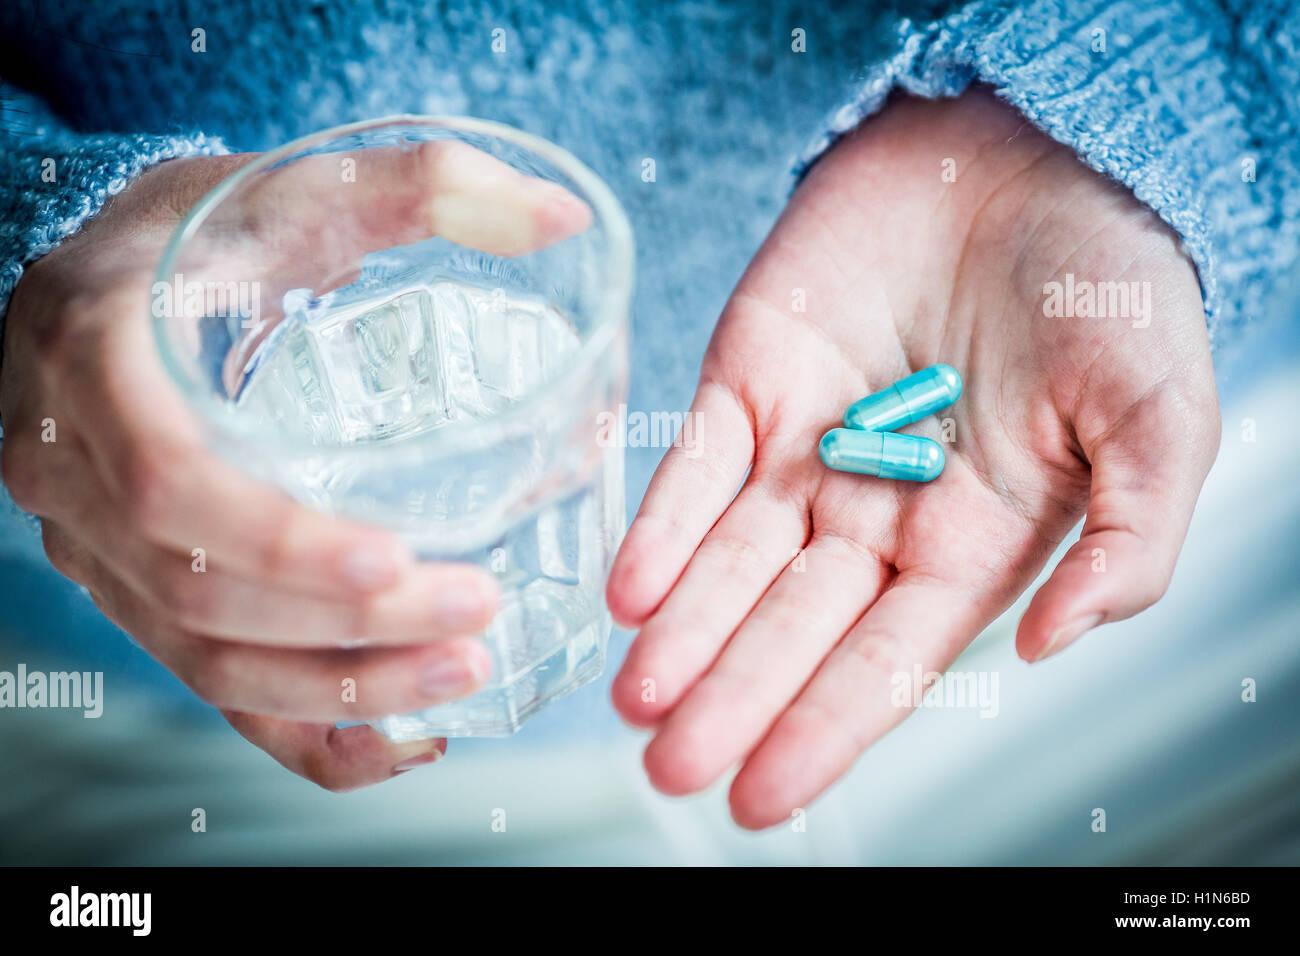 Taking medicine. - Stock Image